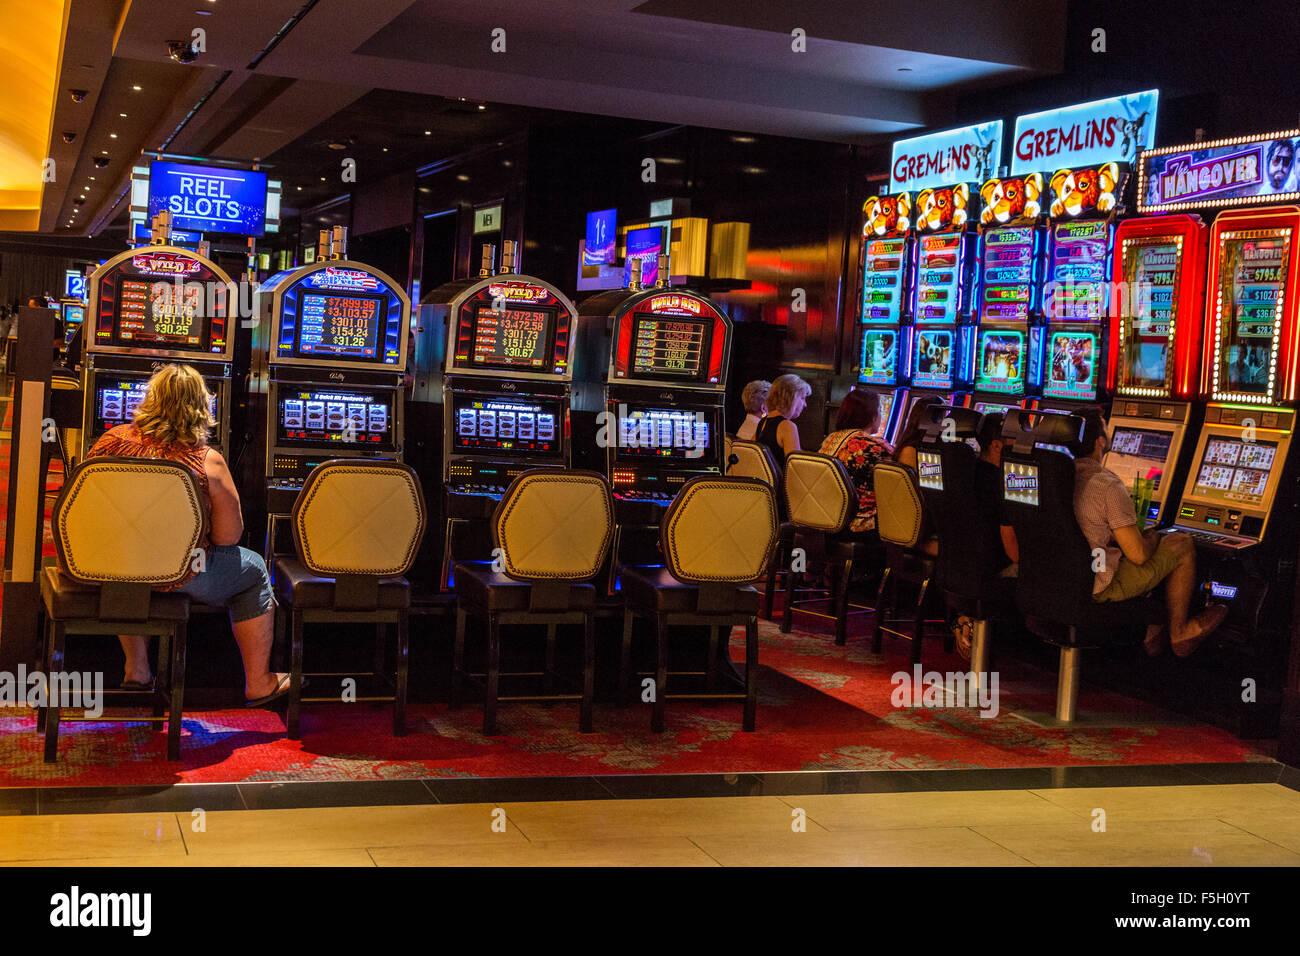 Linq casino games free casino slots games downloads